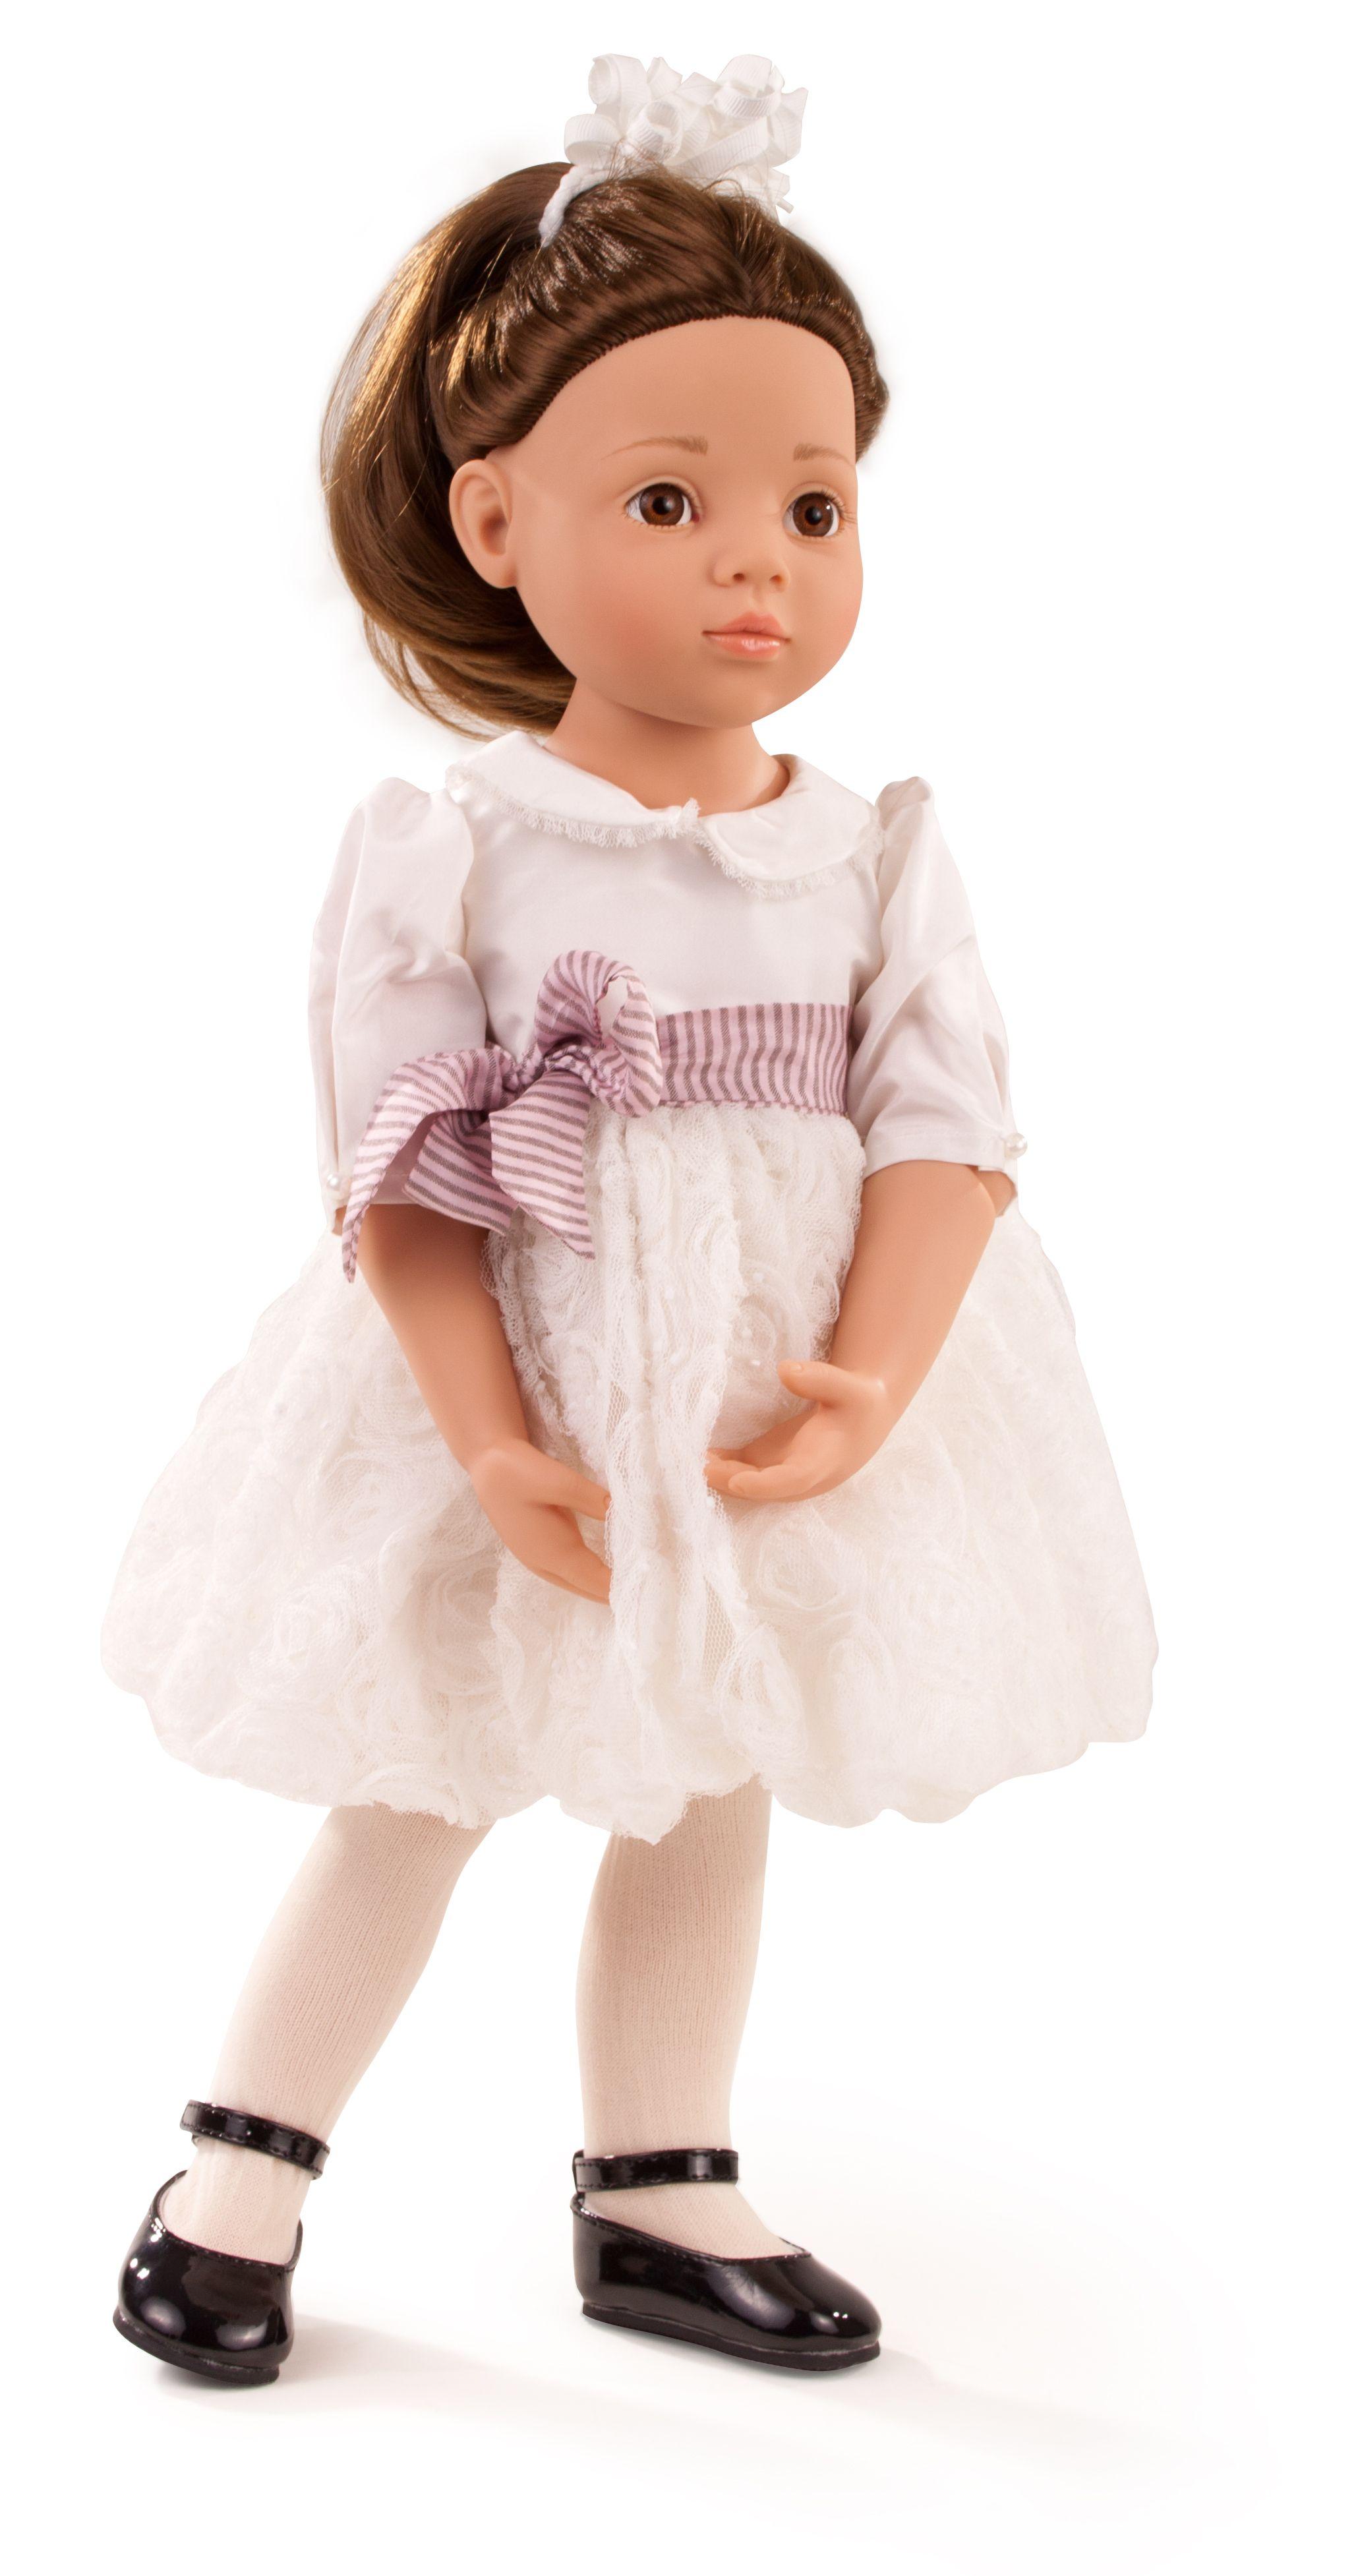 Götz Puppenmanufaktur - Accesorio para muñeca QdSxJjgVn